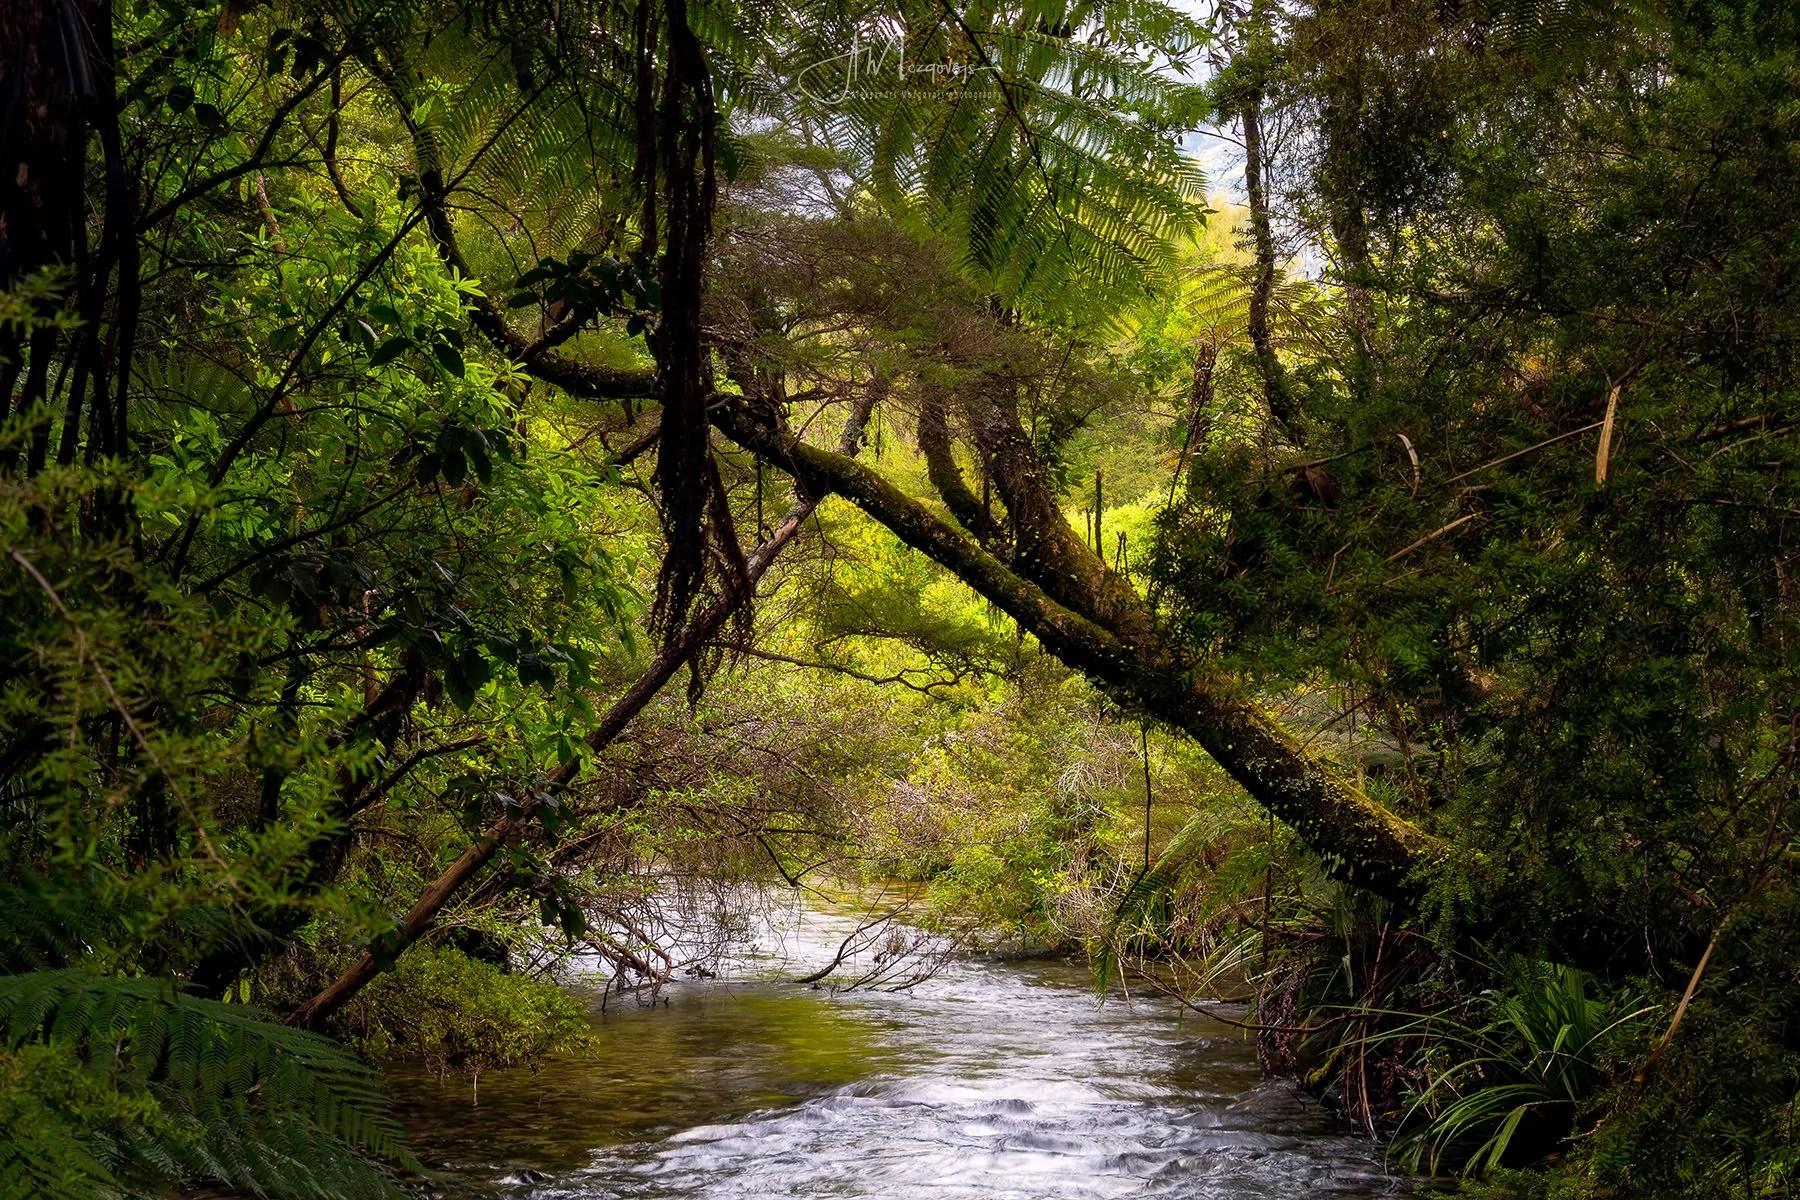 Grove Scenic Reserve feels like a real jungle